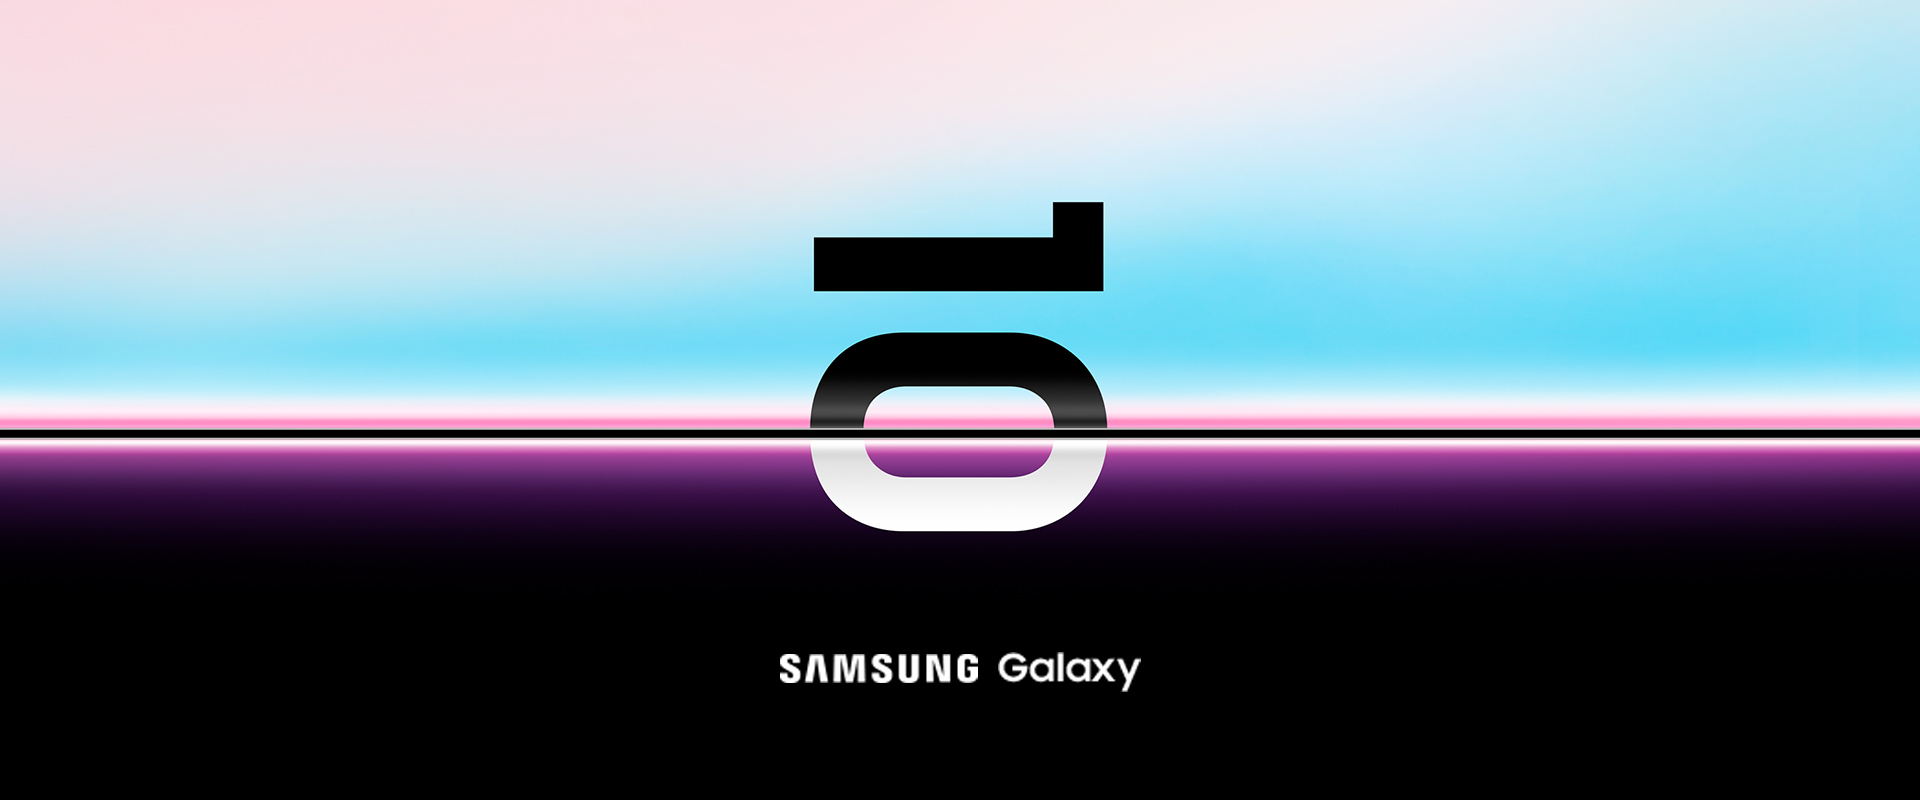 DeFranseKamer-Samsung-pageHeader